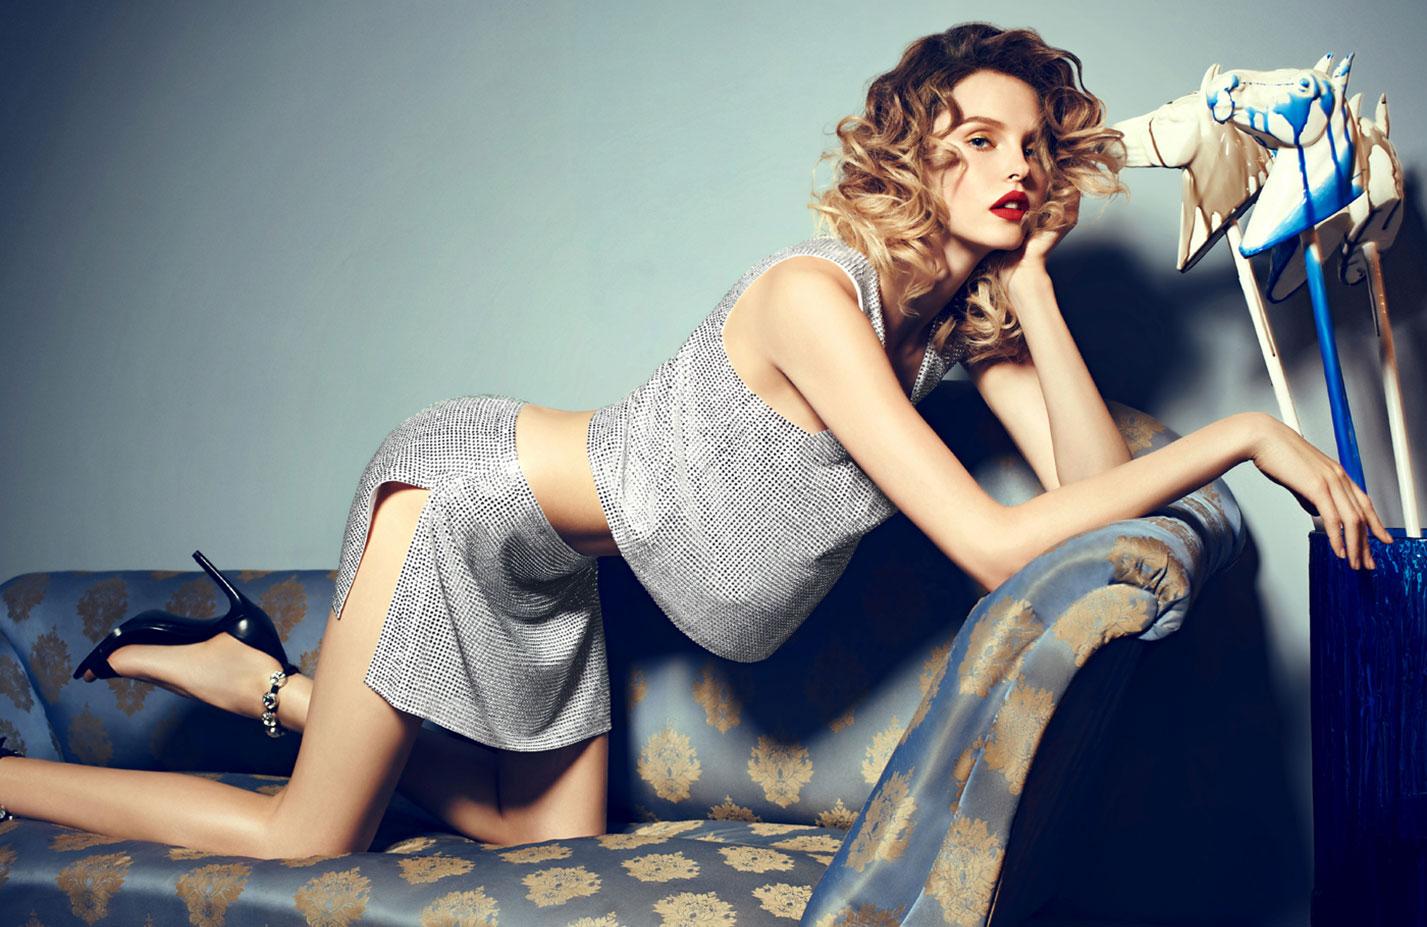 Антонина Ермолина в рекламной кампании модного бренда Au Pont Rouge, весна-лето 2017 / фото 01